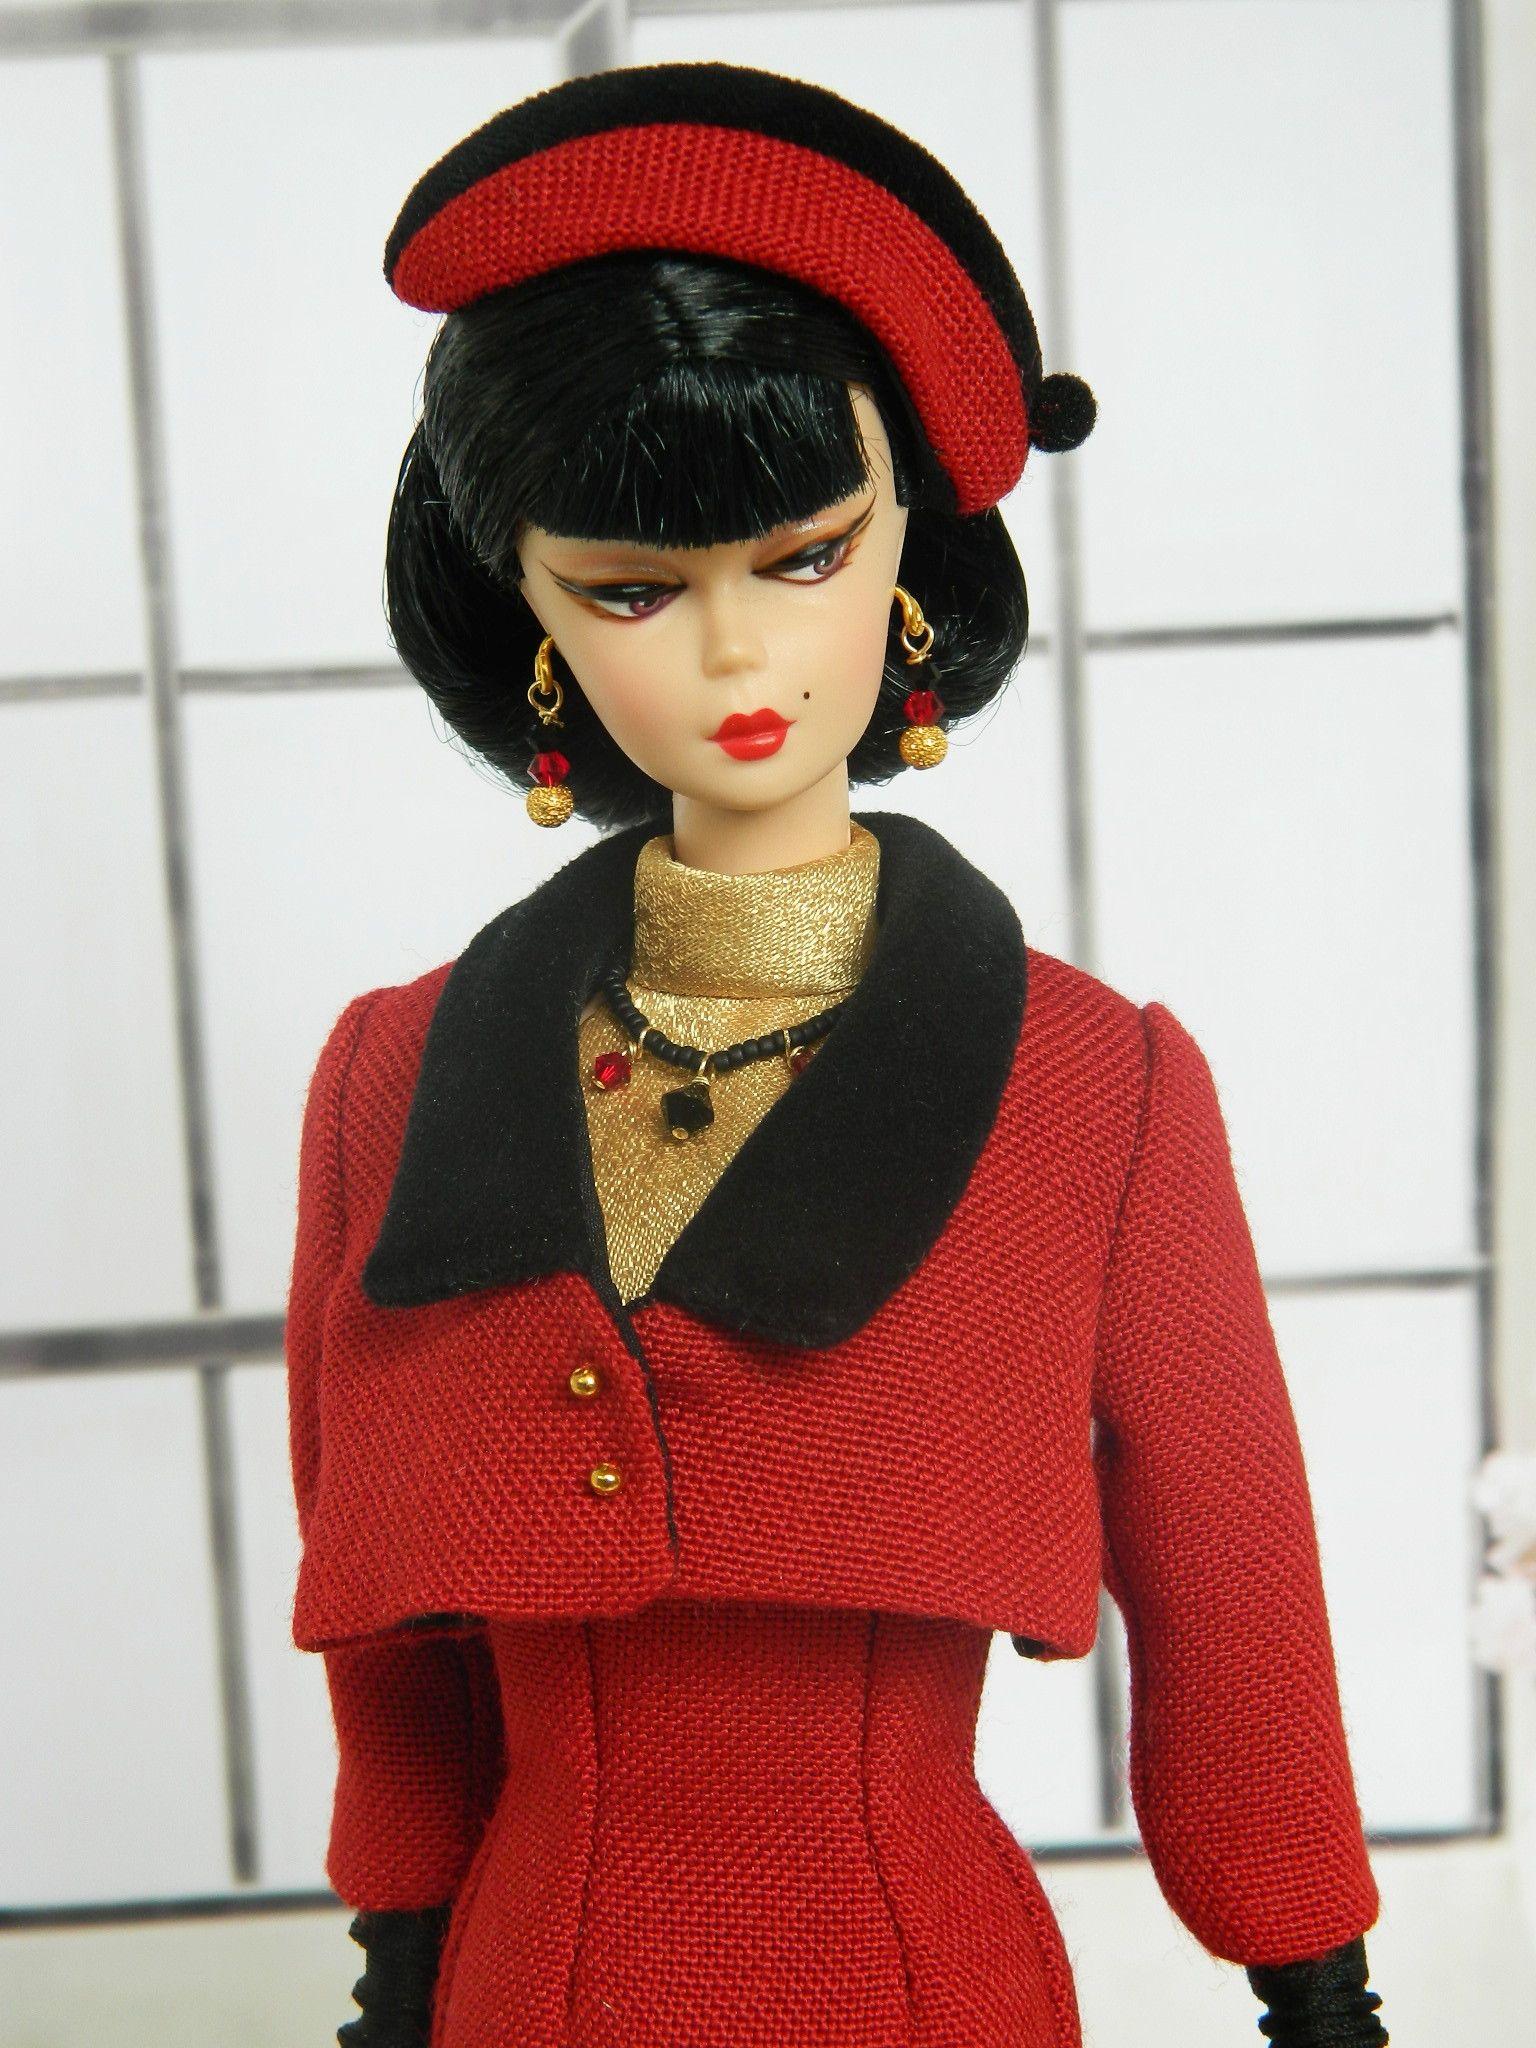 Pin on Fashion dolls